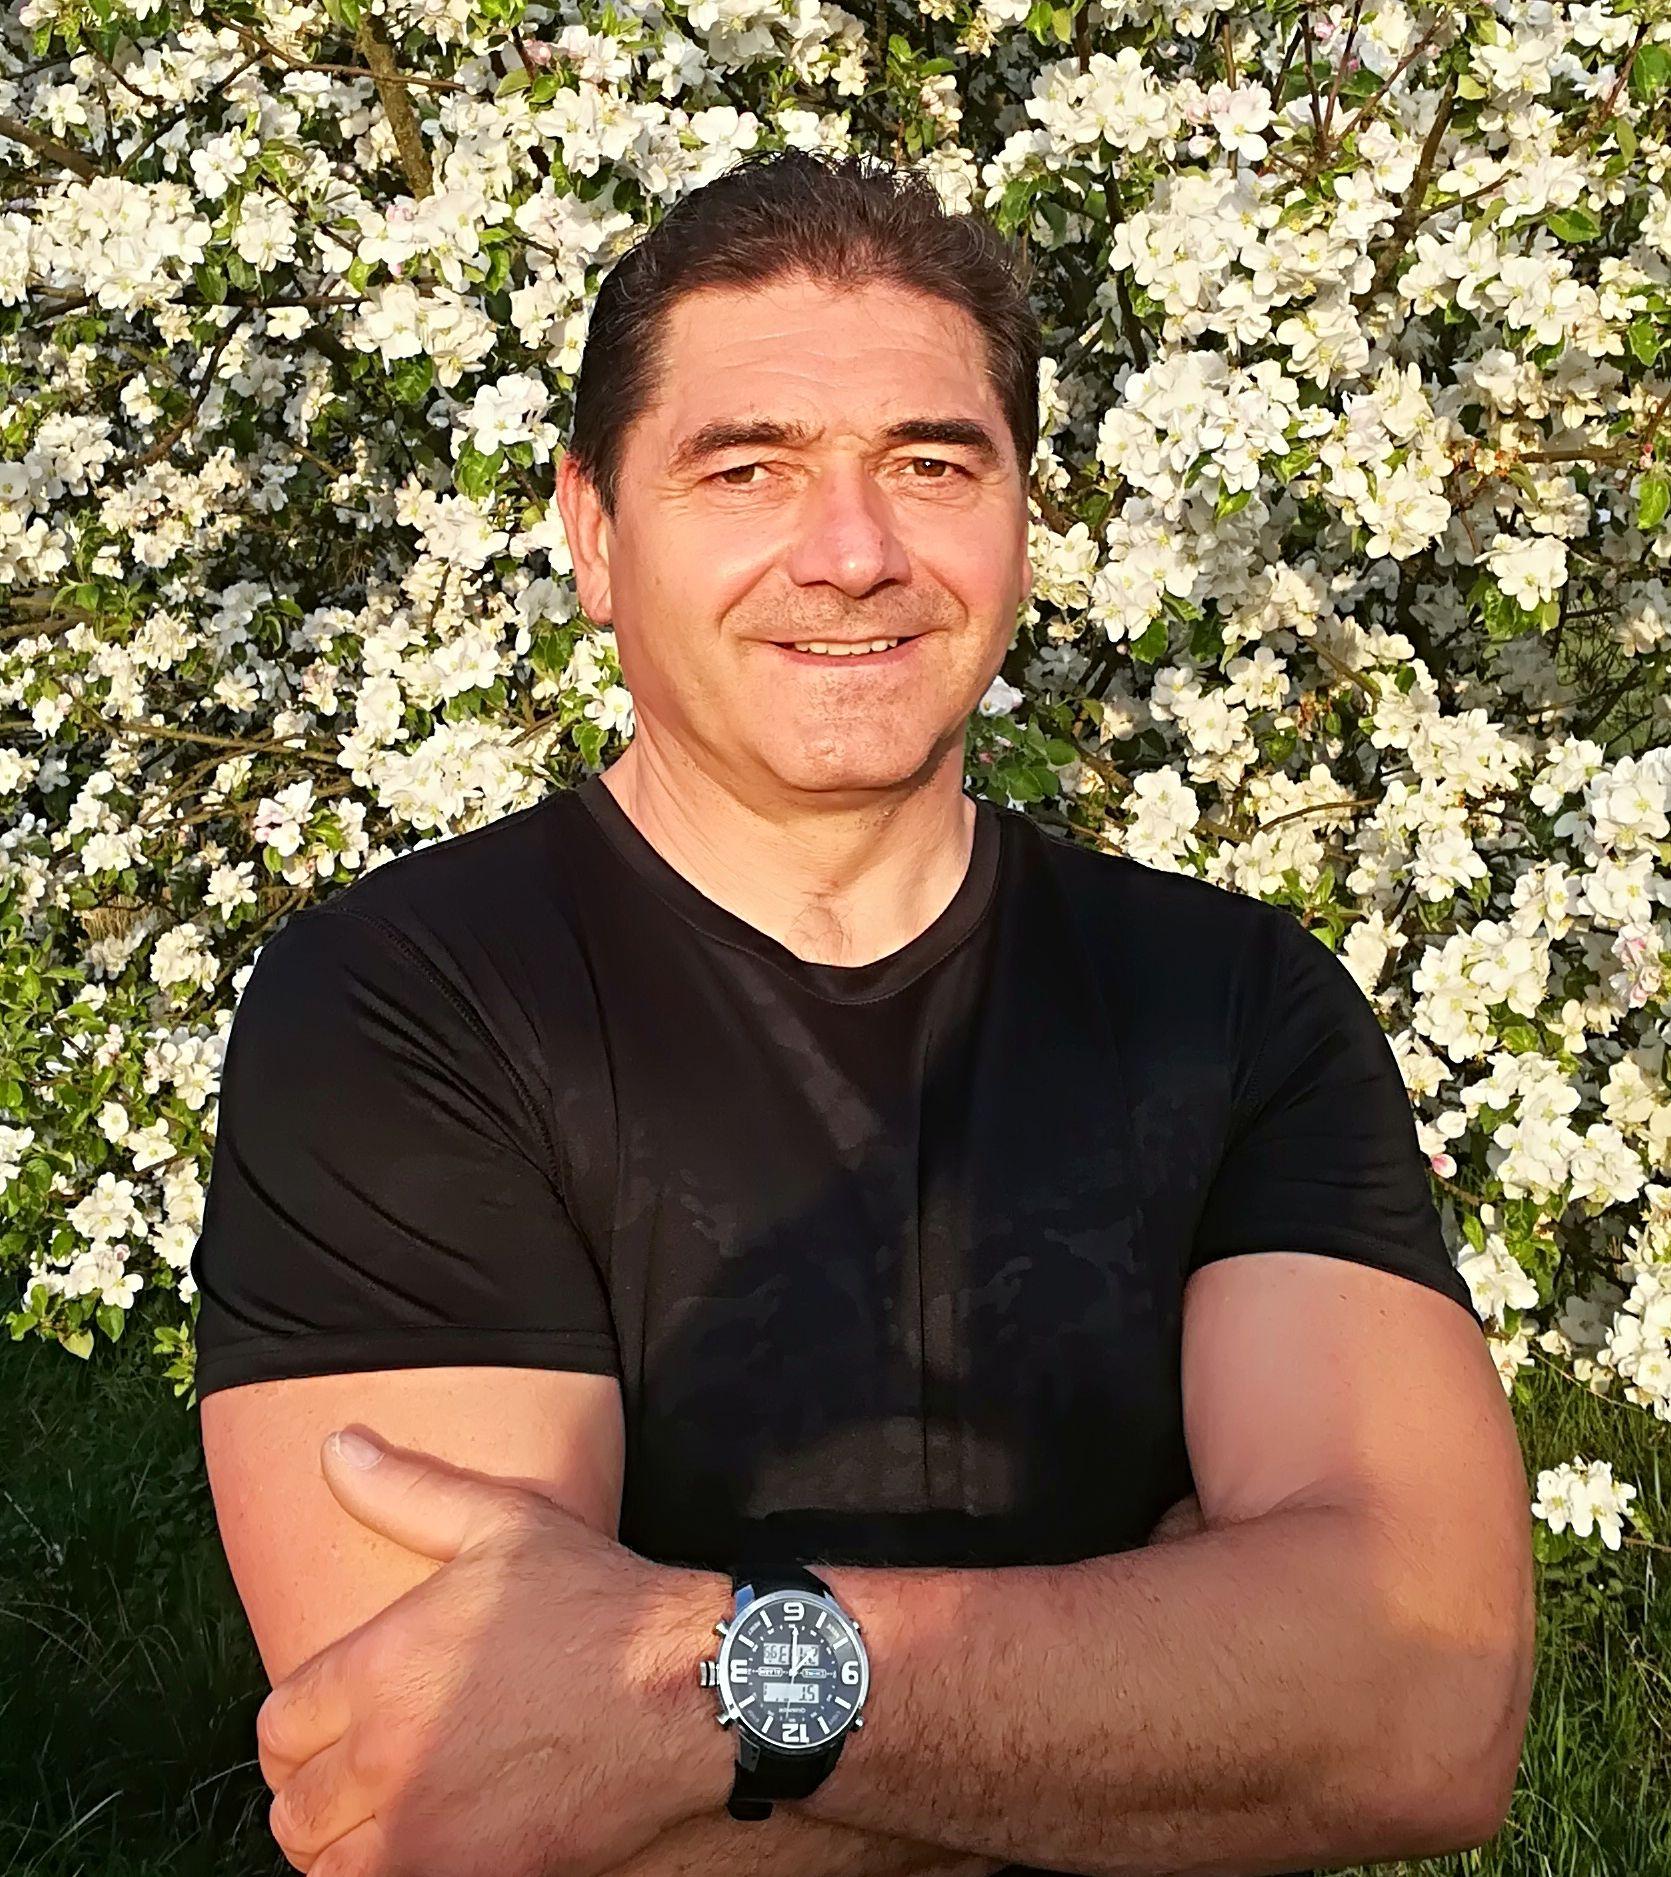 Mojmir Vaclavek